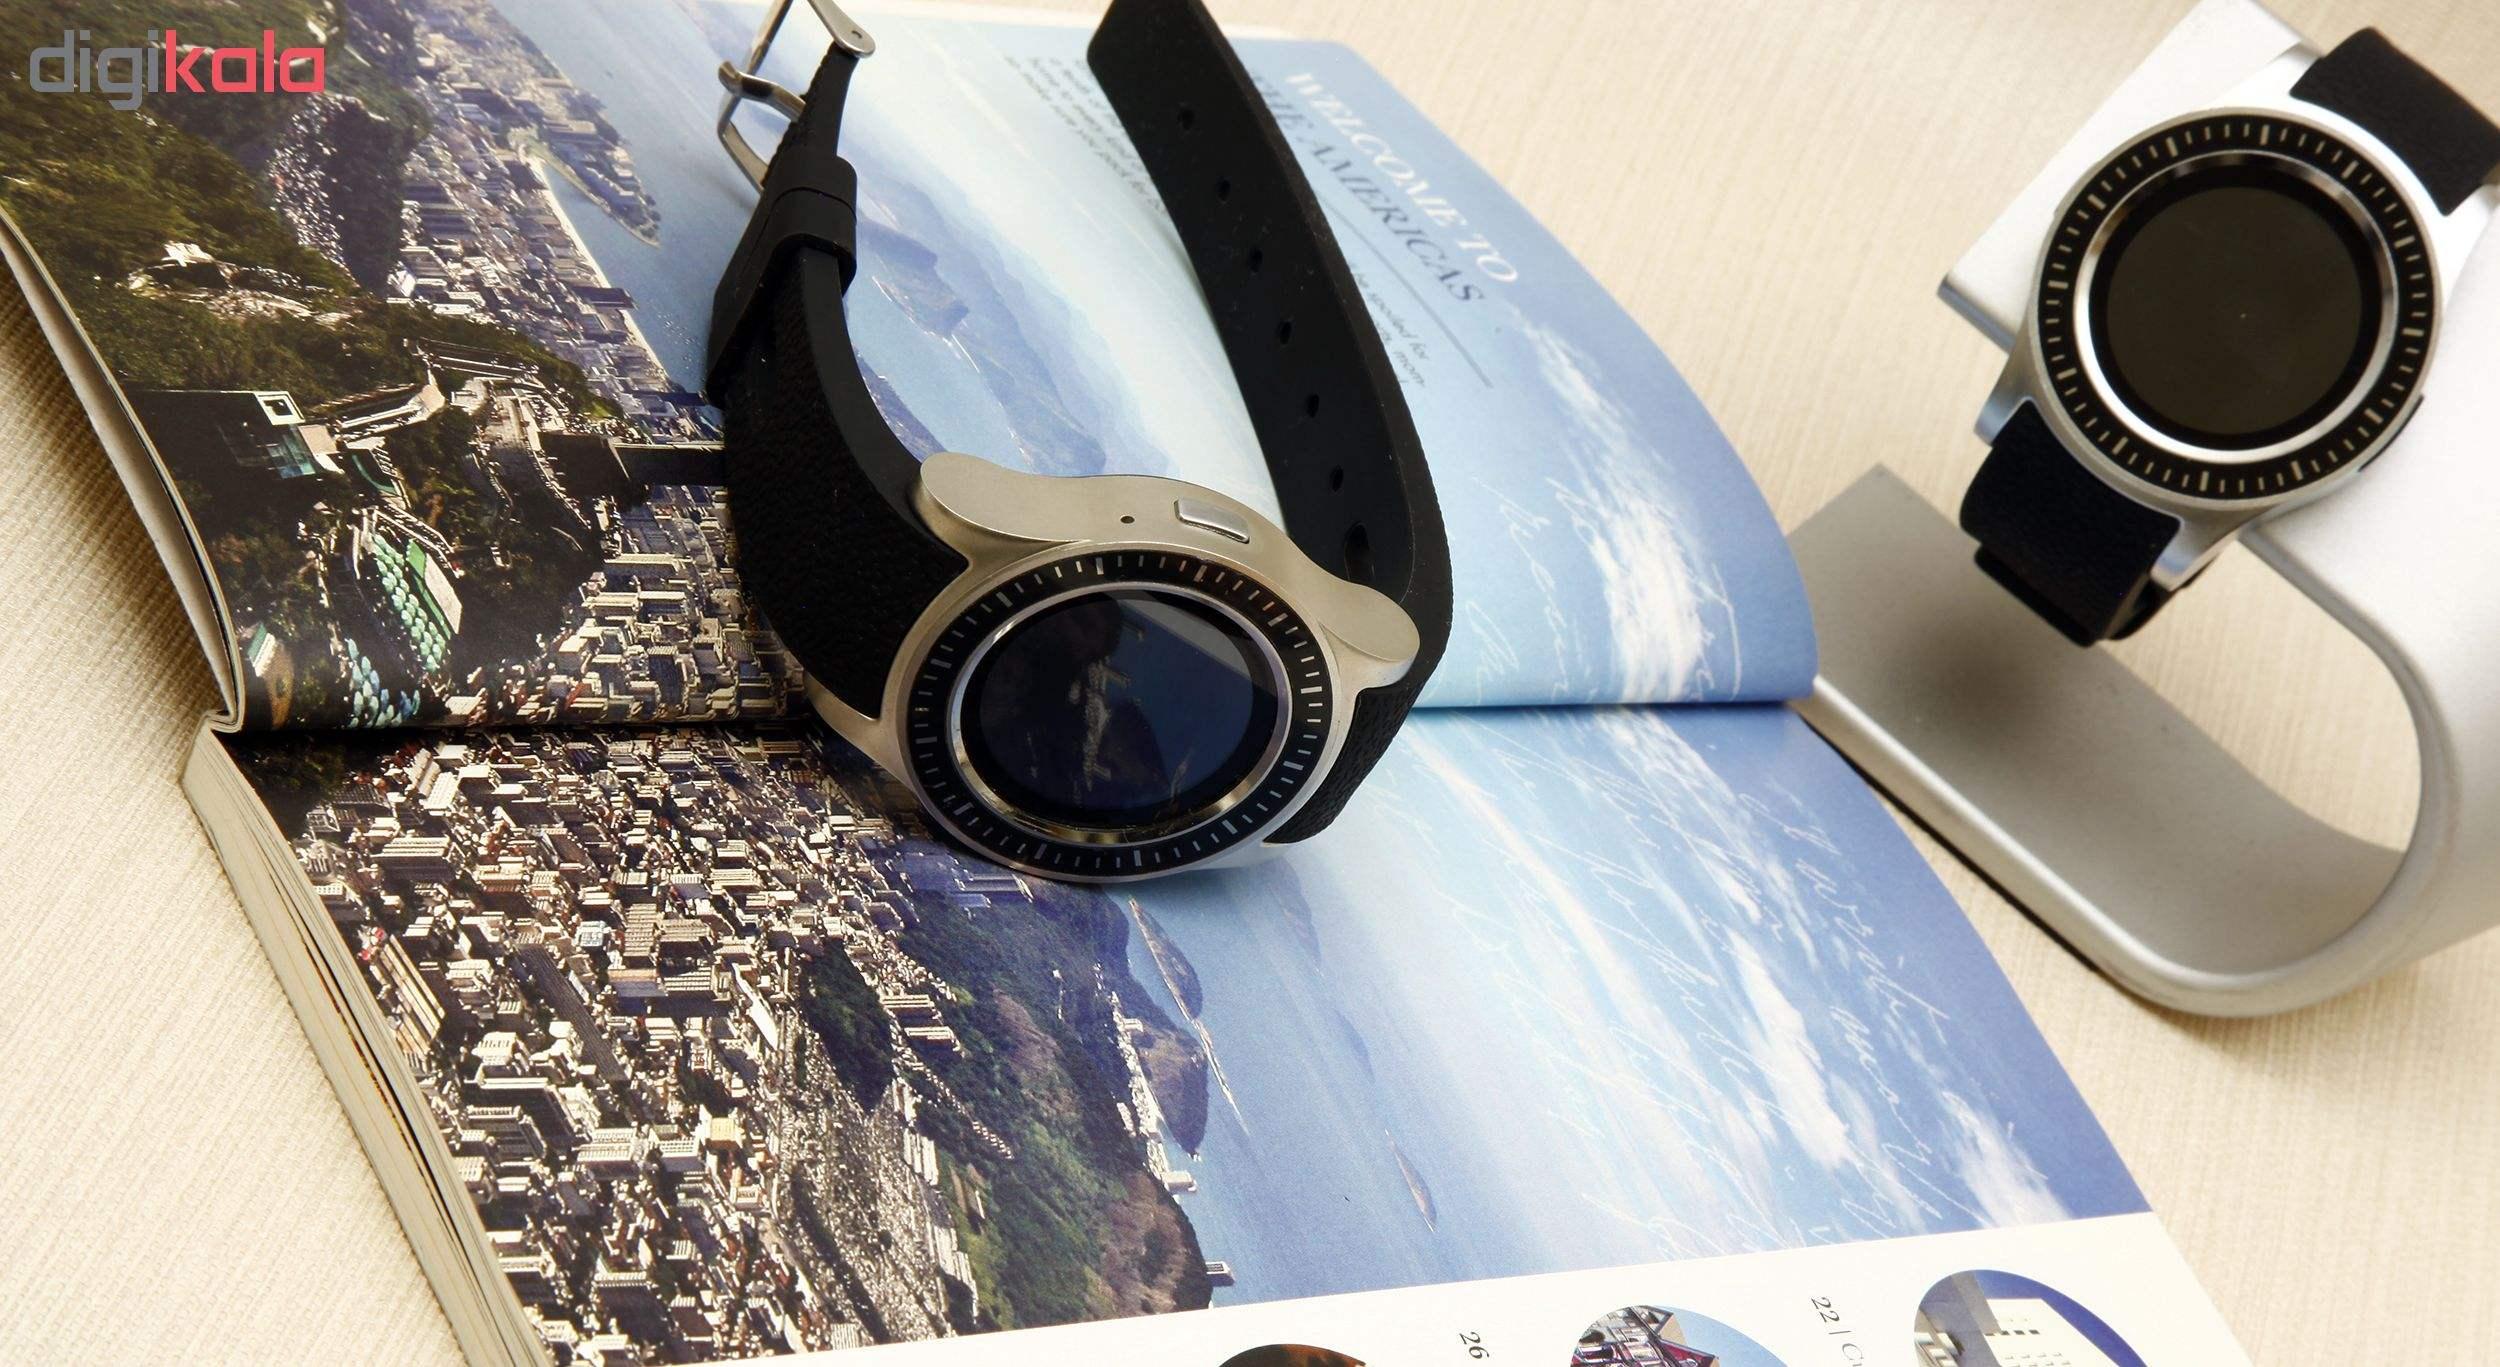 ساعت هوشمند جی تب مدل S1 main 1 4